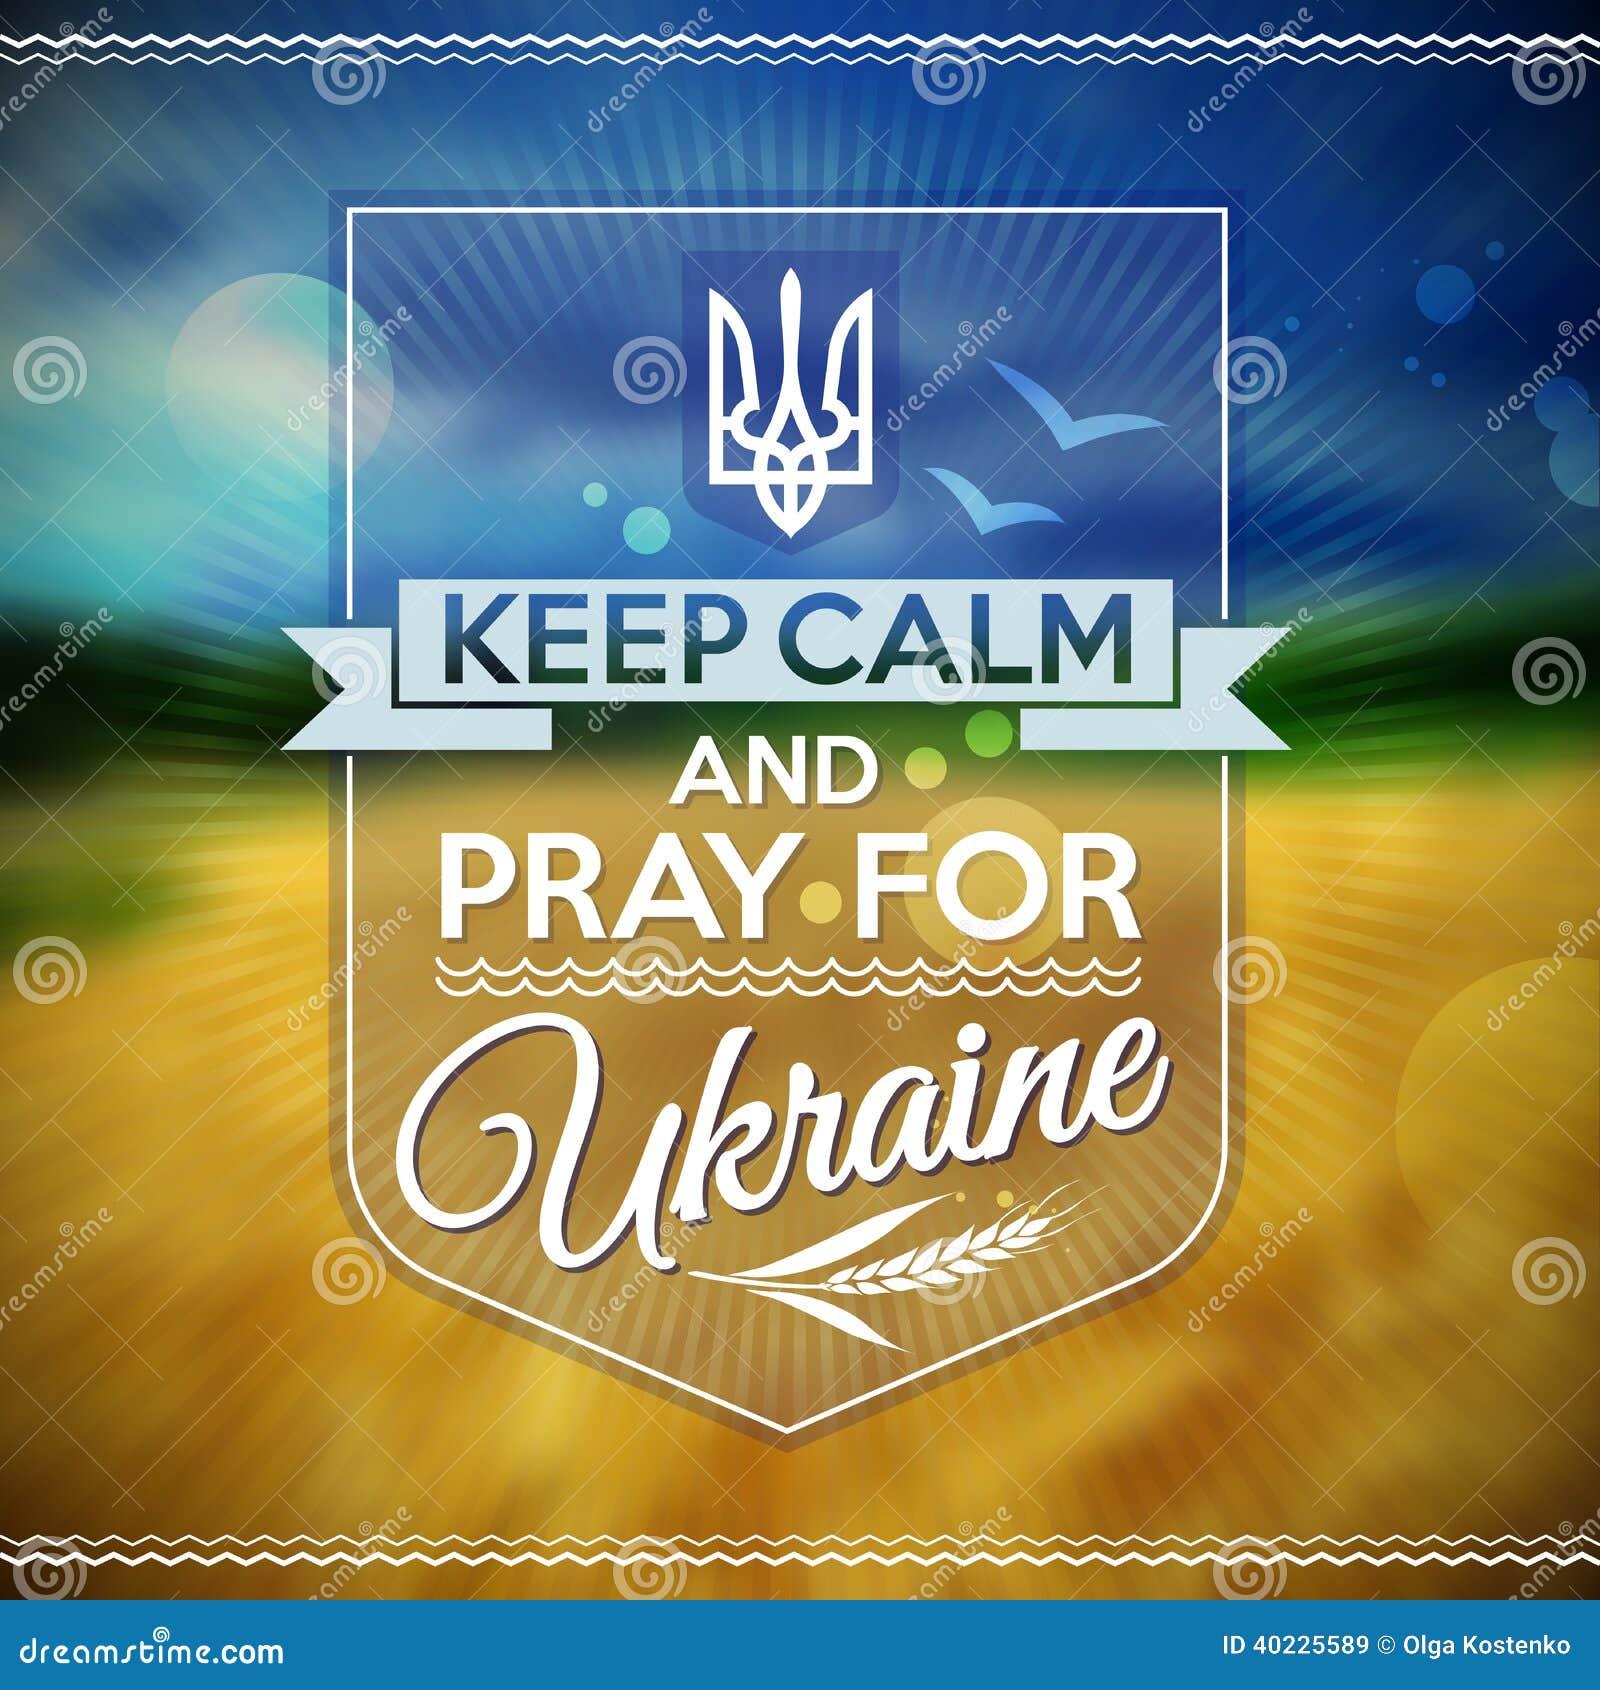 Keep Calm Pray Ukraine Poster Typographical Design Vector Image